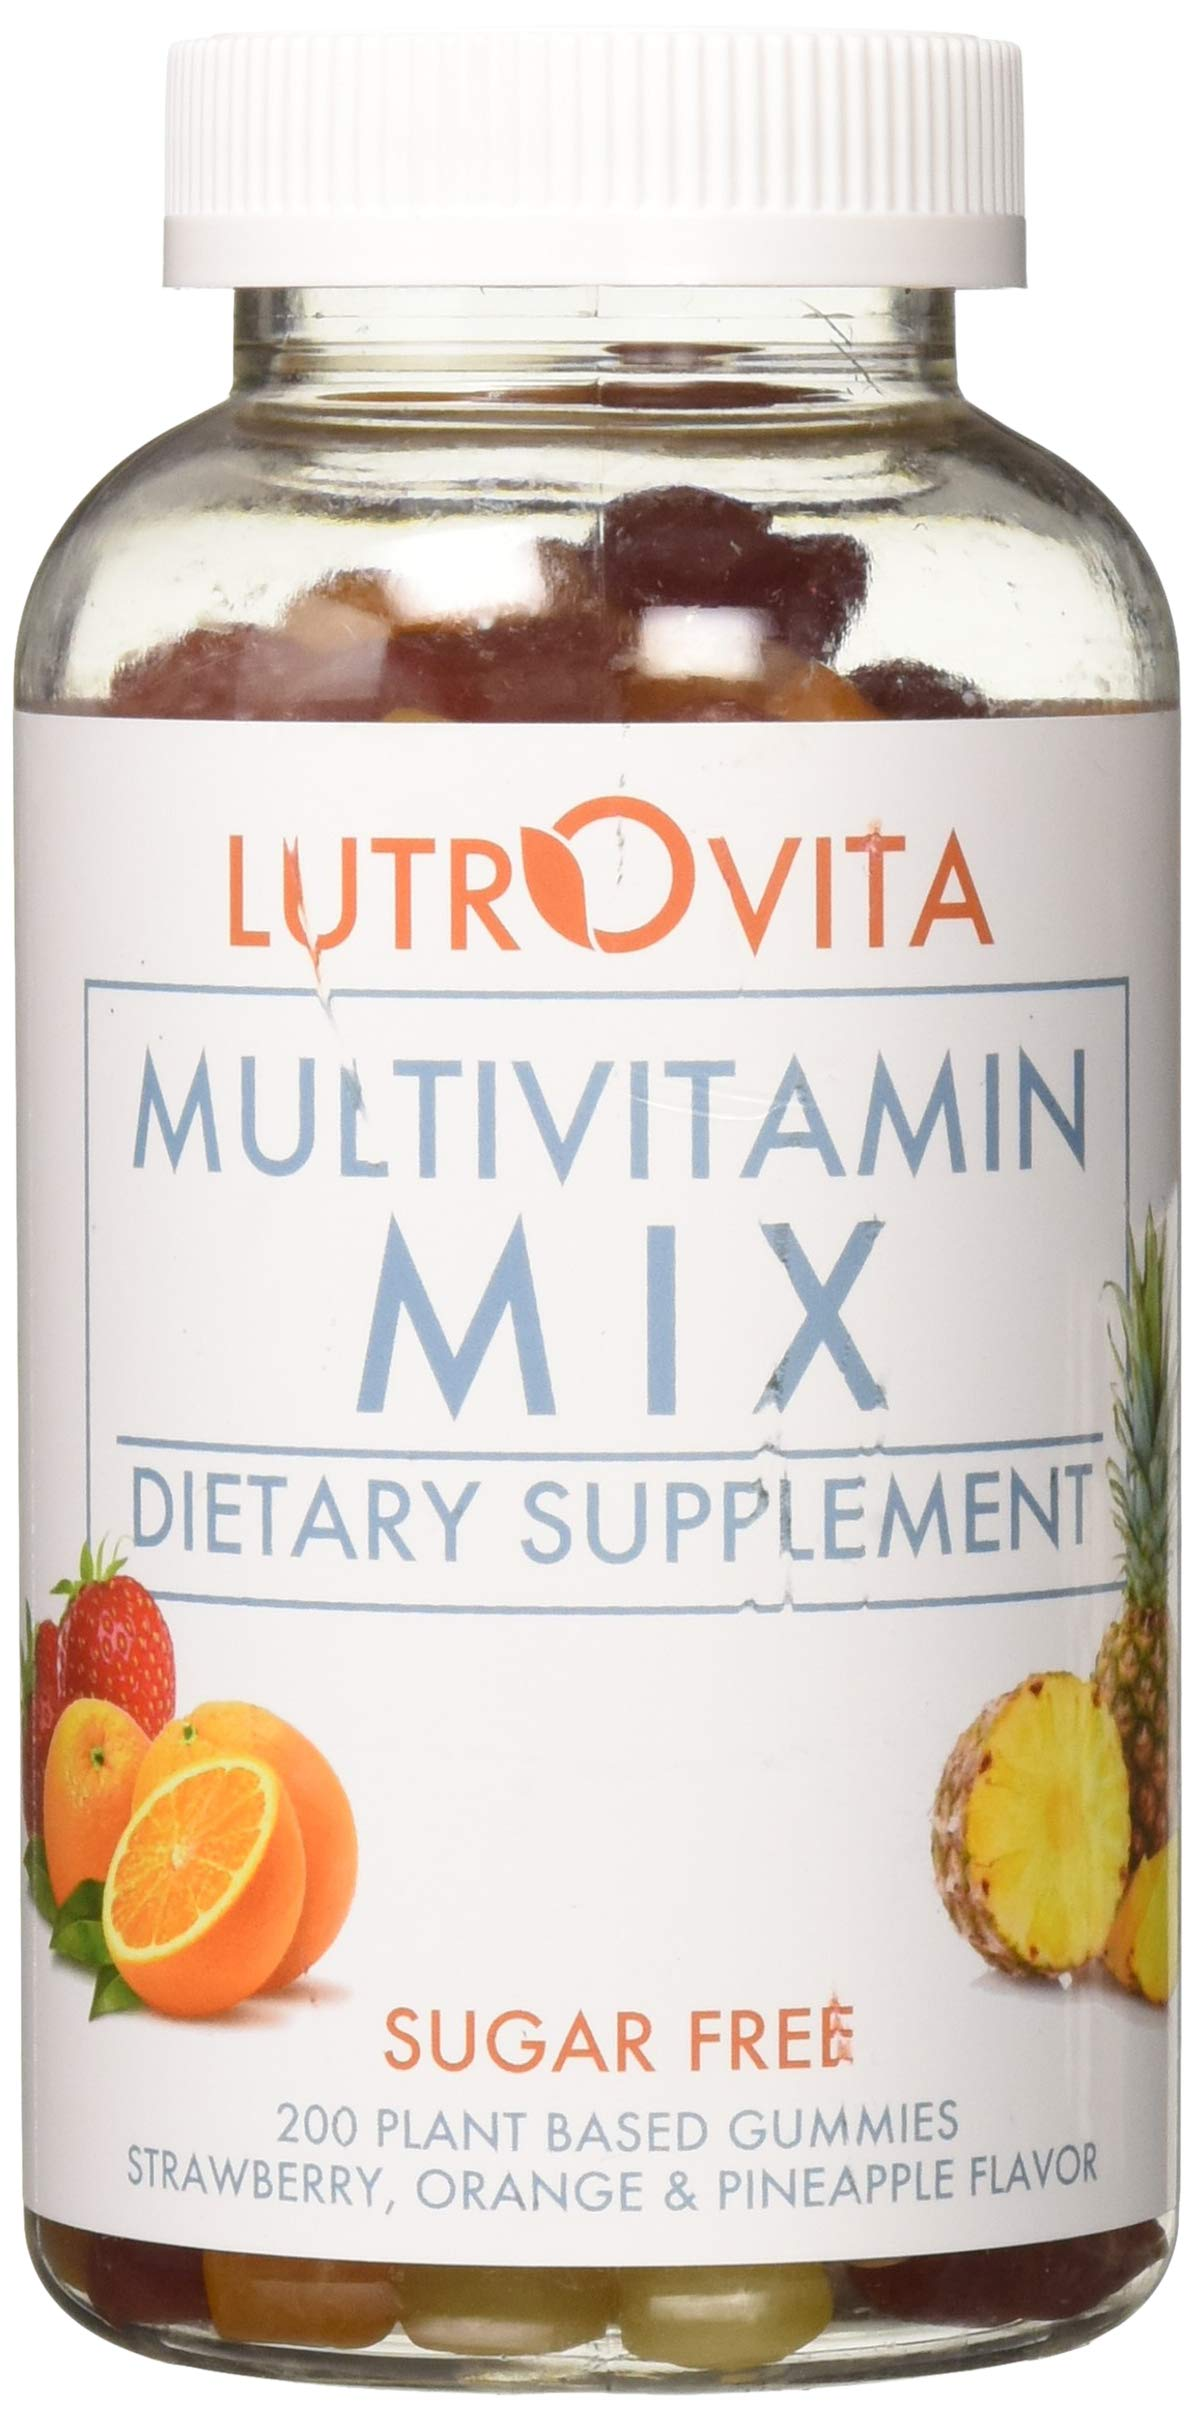 Lutrovita Sugar Free Multivitamin Gummy, Pineapple, Orange, Strawberry, 200 Count